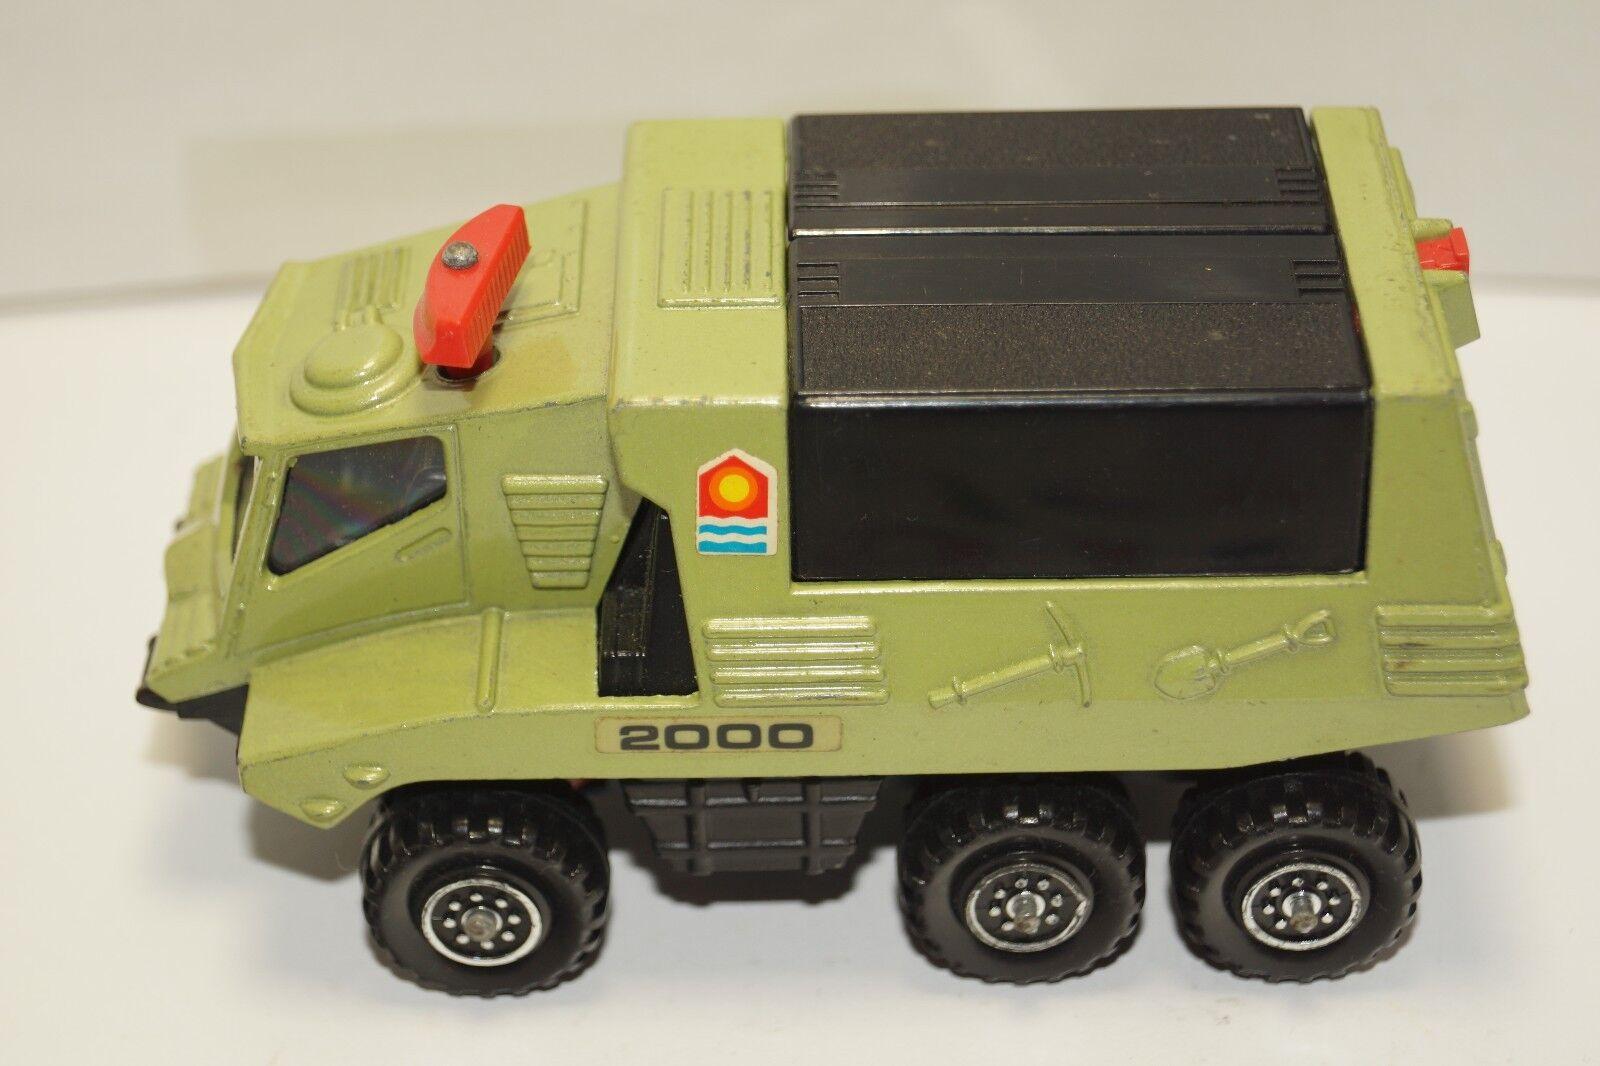 ORIGINAL Matchbox - Battle Kings - K-111 - Missile Launcher - Green color